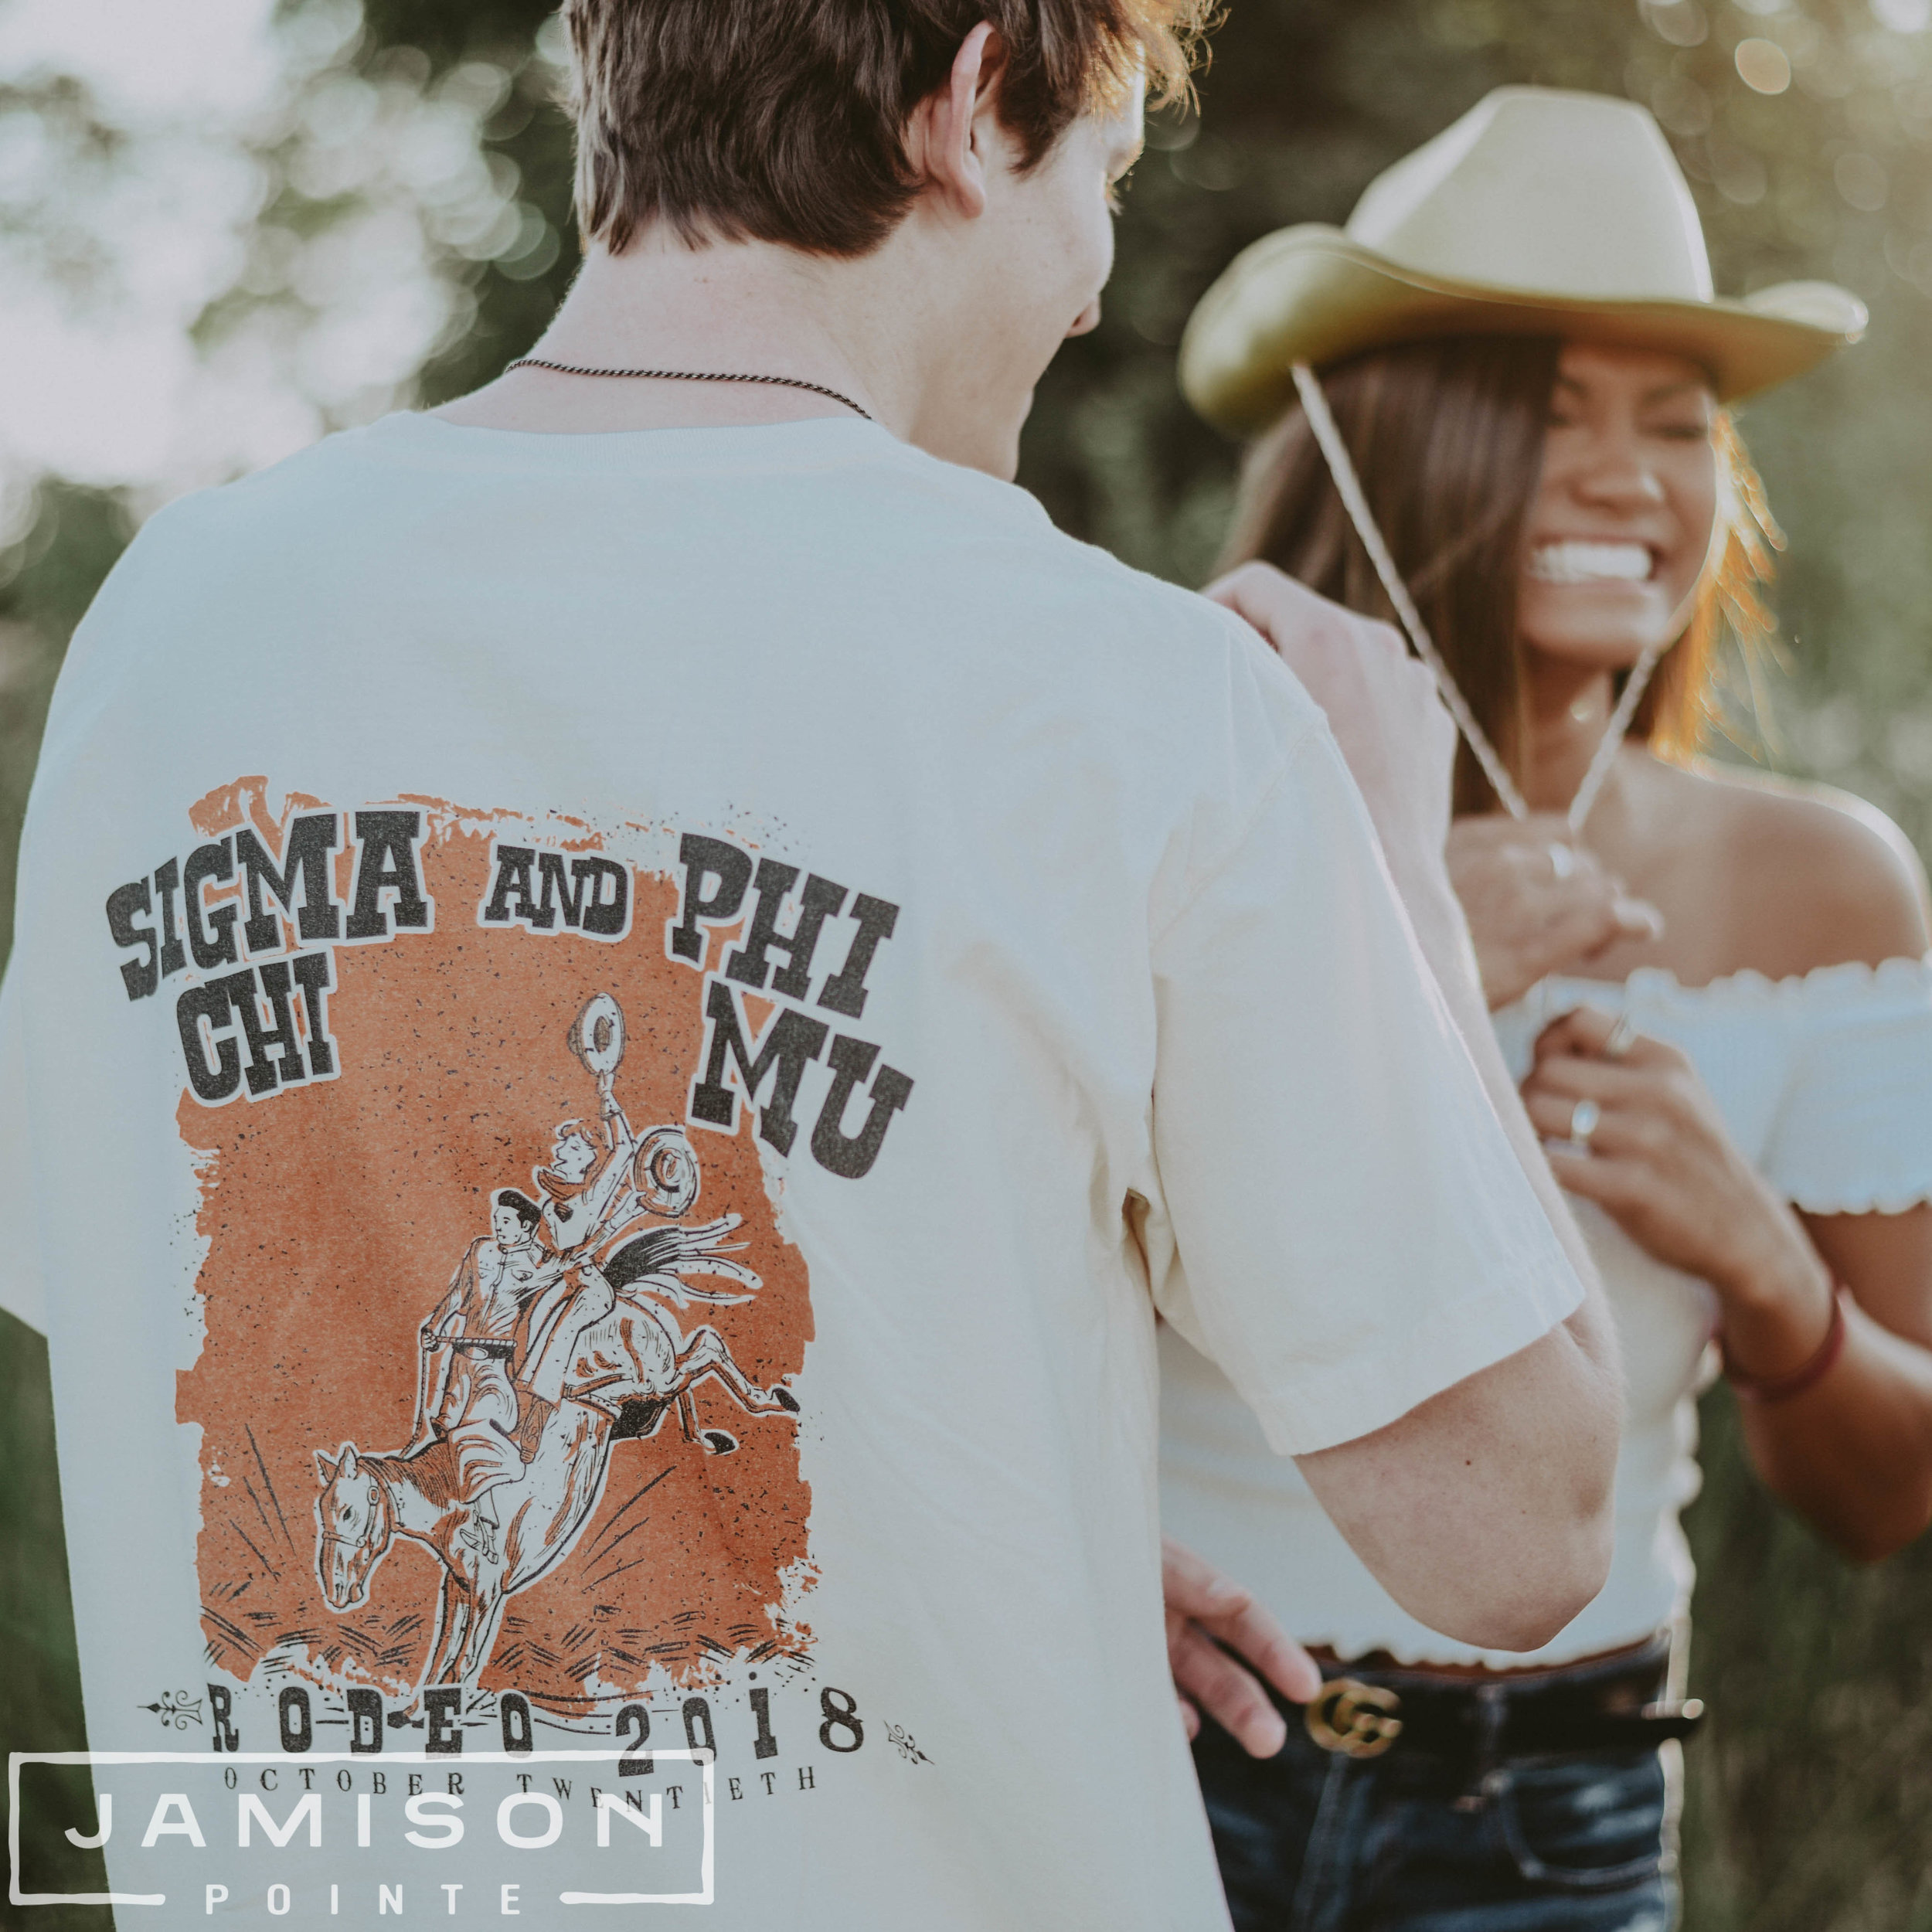 Sigma Chi Rodeo Tshirt